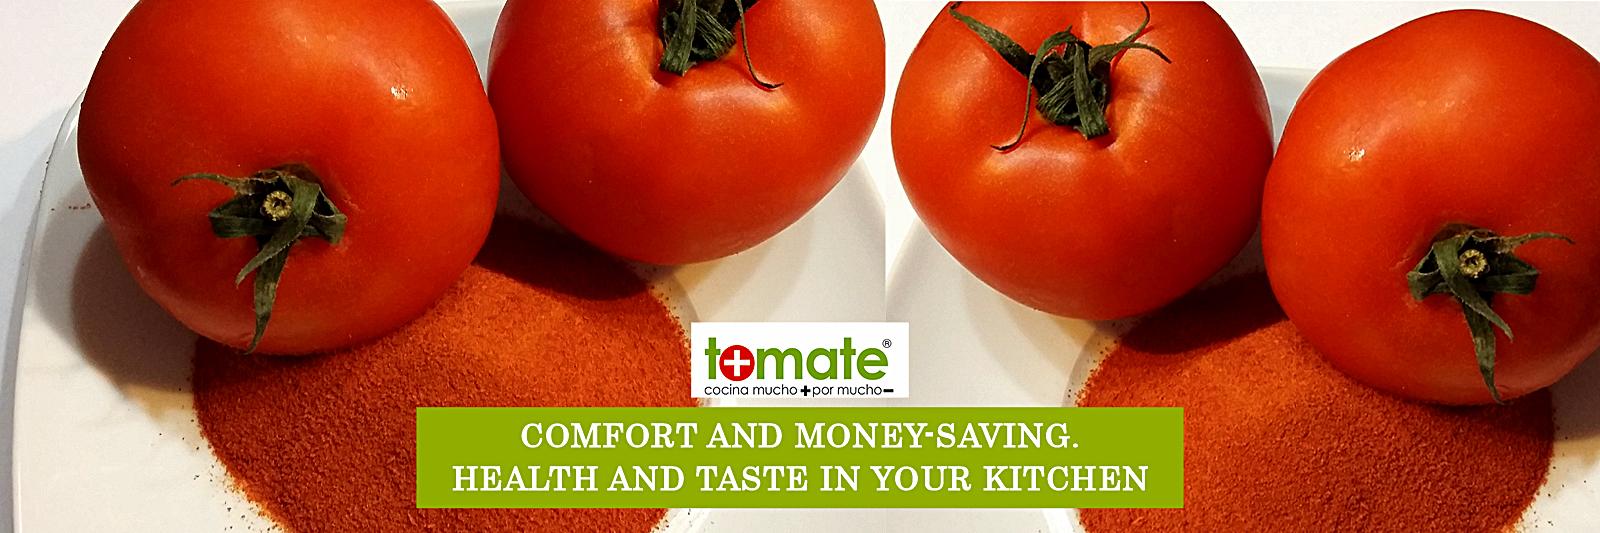 Comfort and money-saving